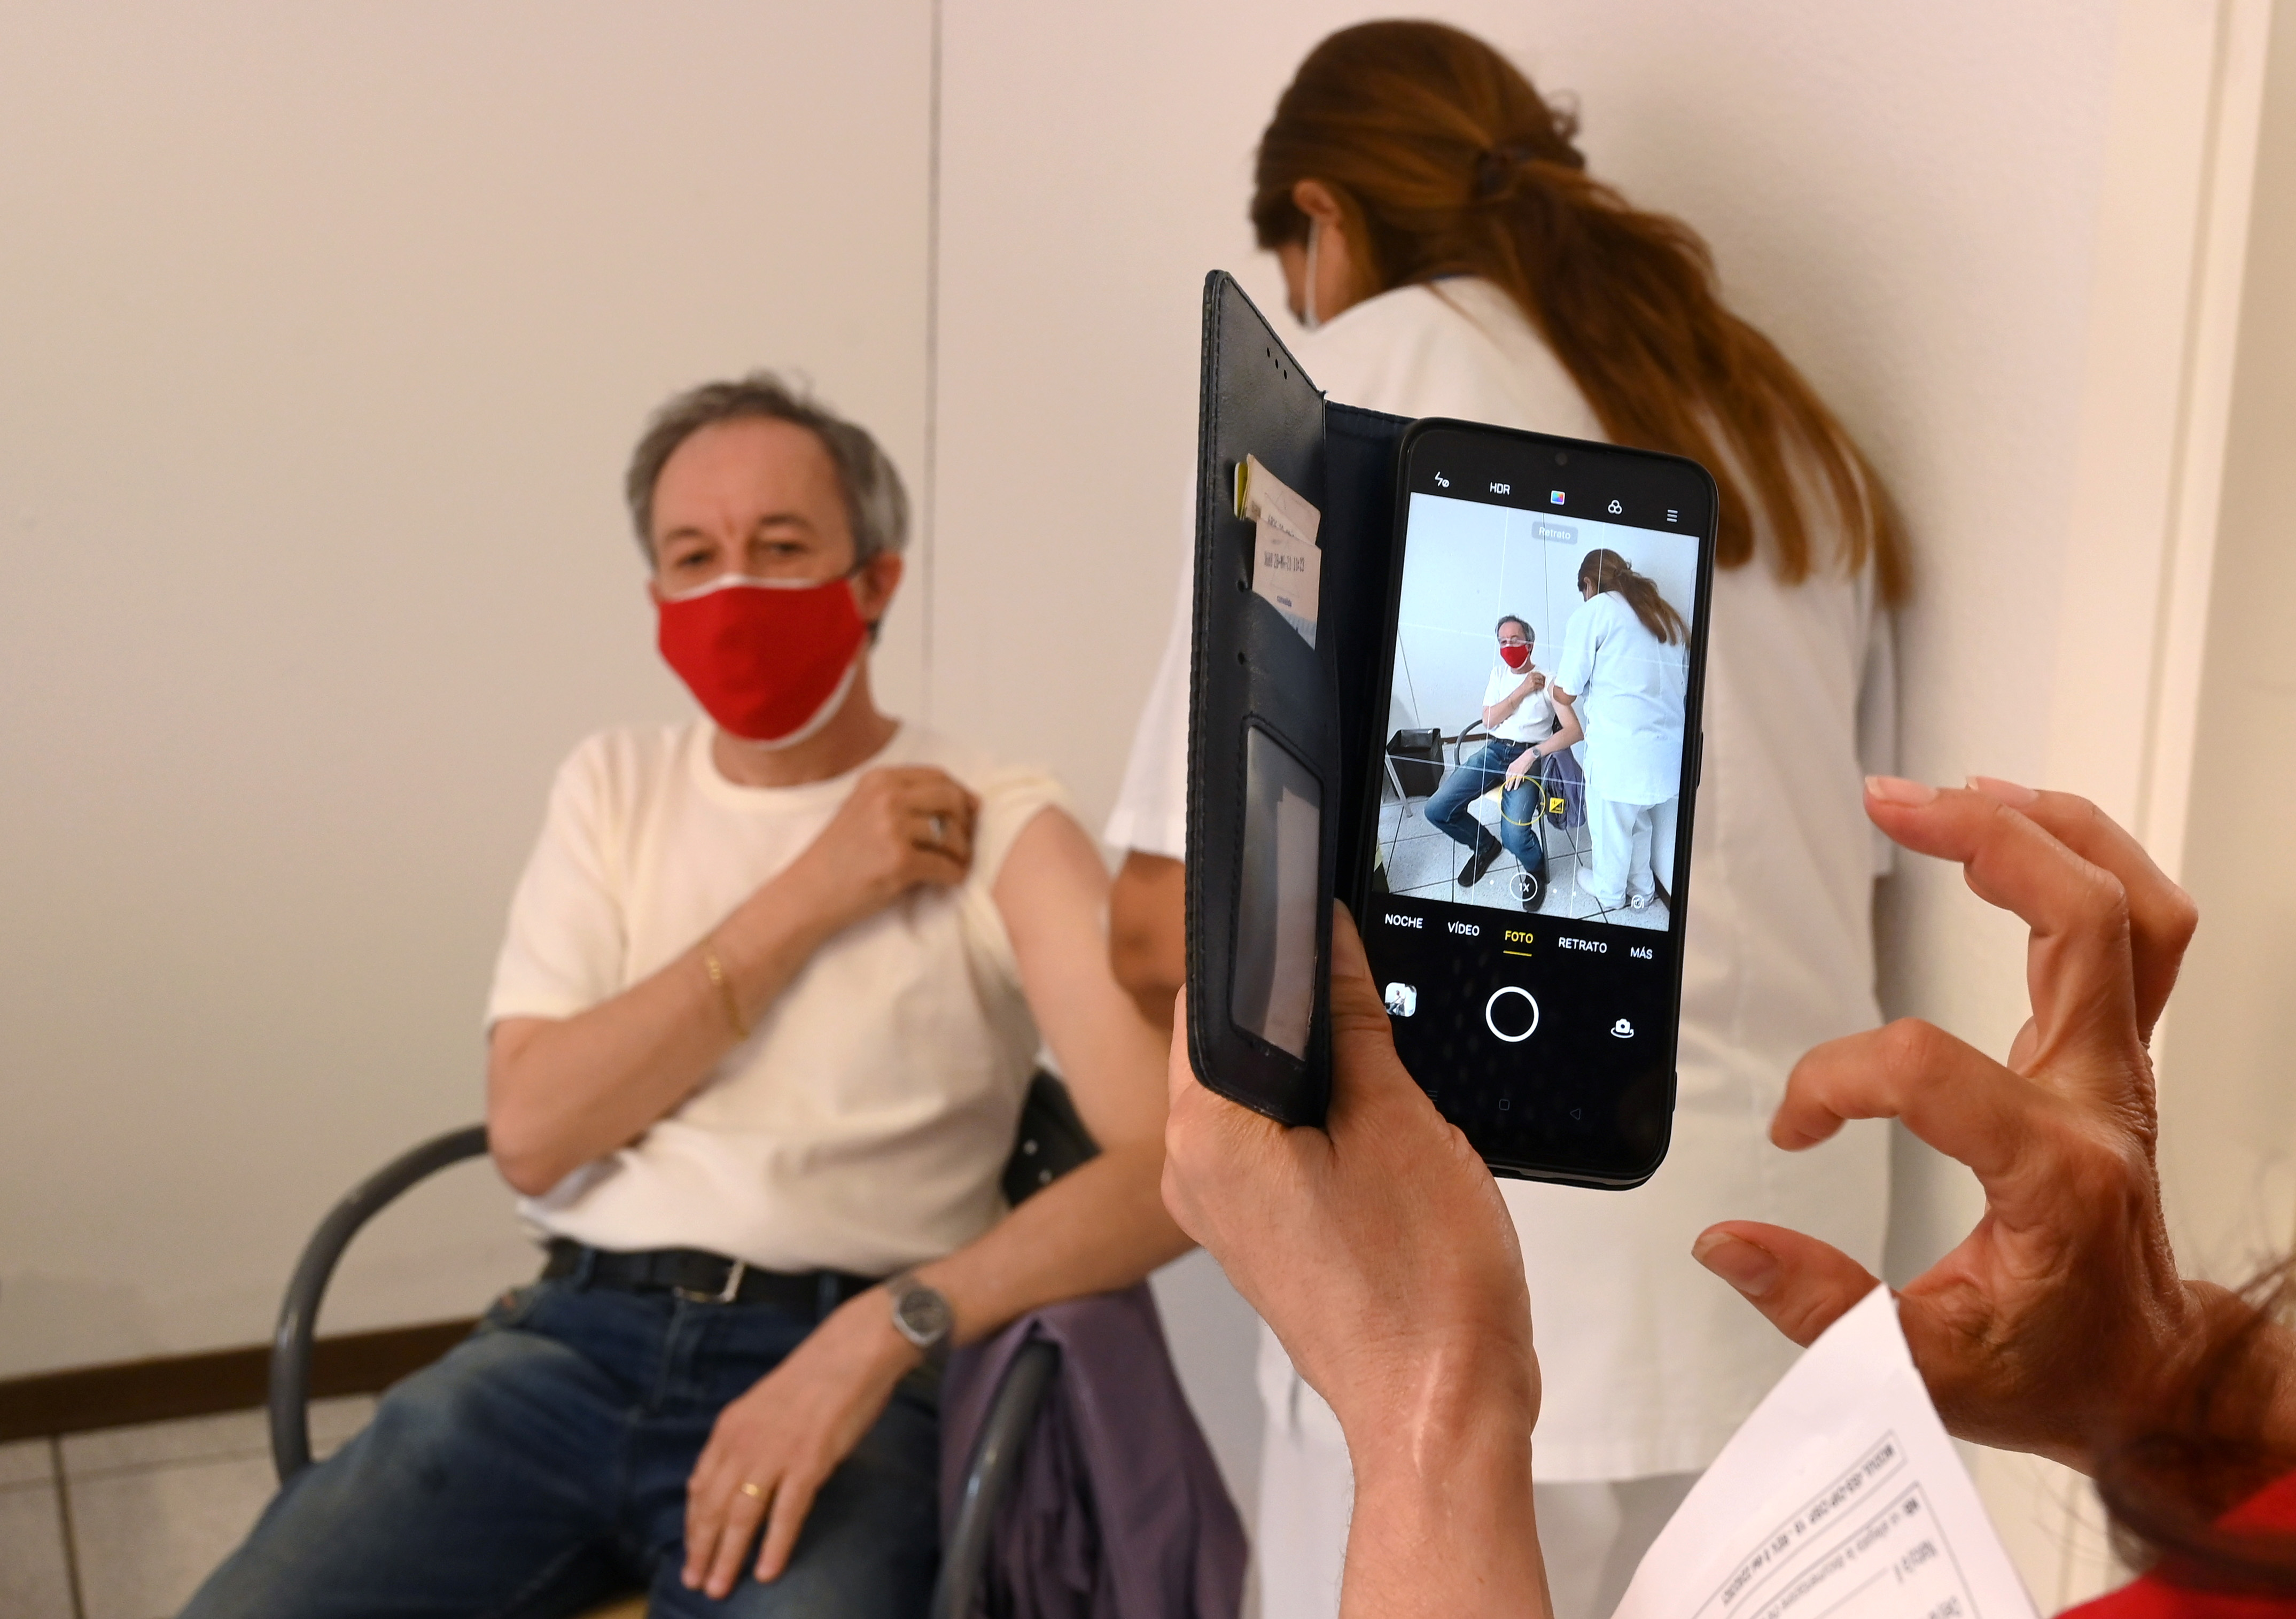 Italian citizen Silvano Cecconi, receives a dose of Russia's Sputnik V COVID-19 vaccine, as the Republic of San Marino starts a campaign inviting tourists to get vaccinated, June 1, 2021. Picture taken June 1, 2021. REUTERS/Alberto Lingria